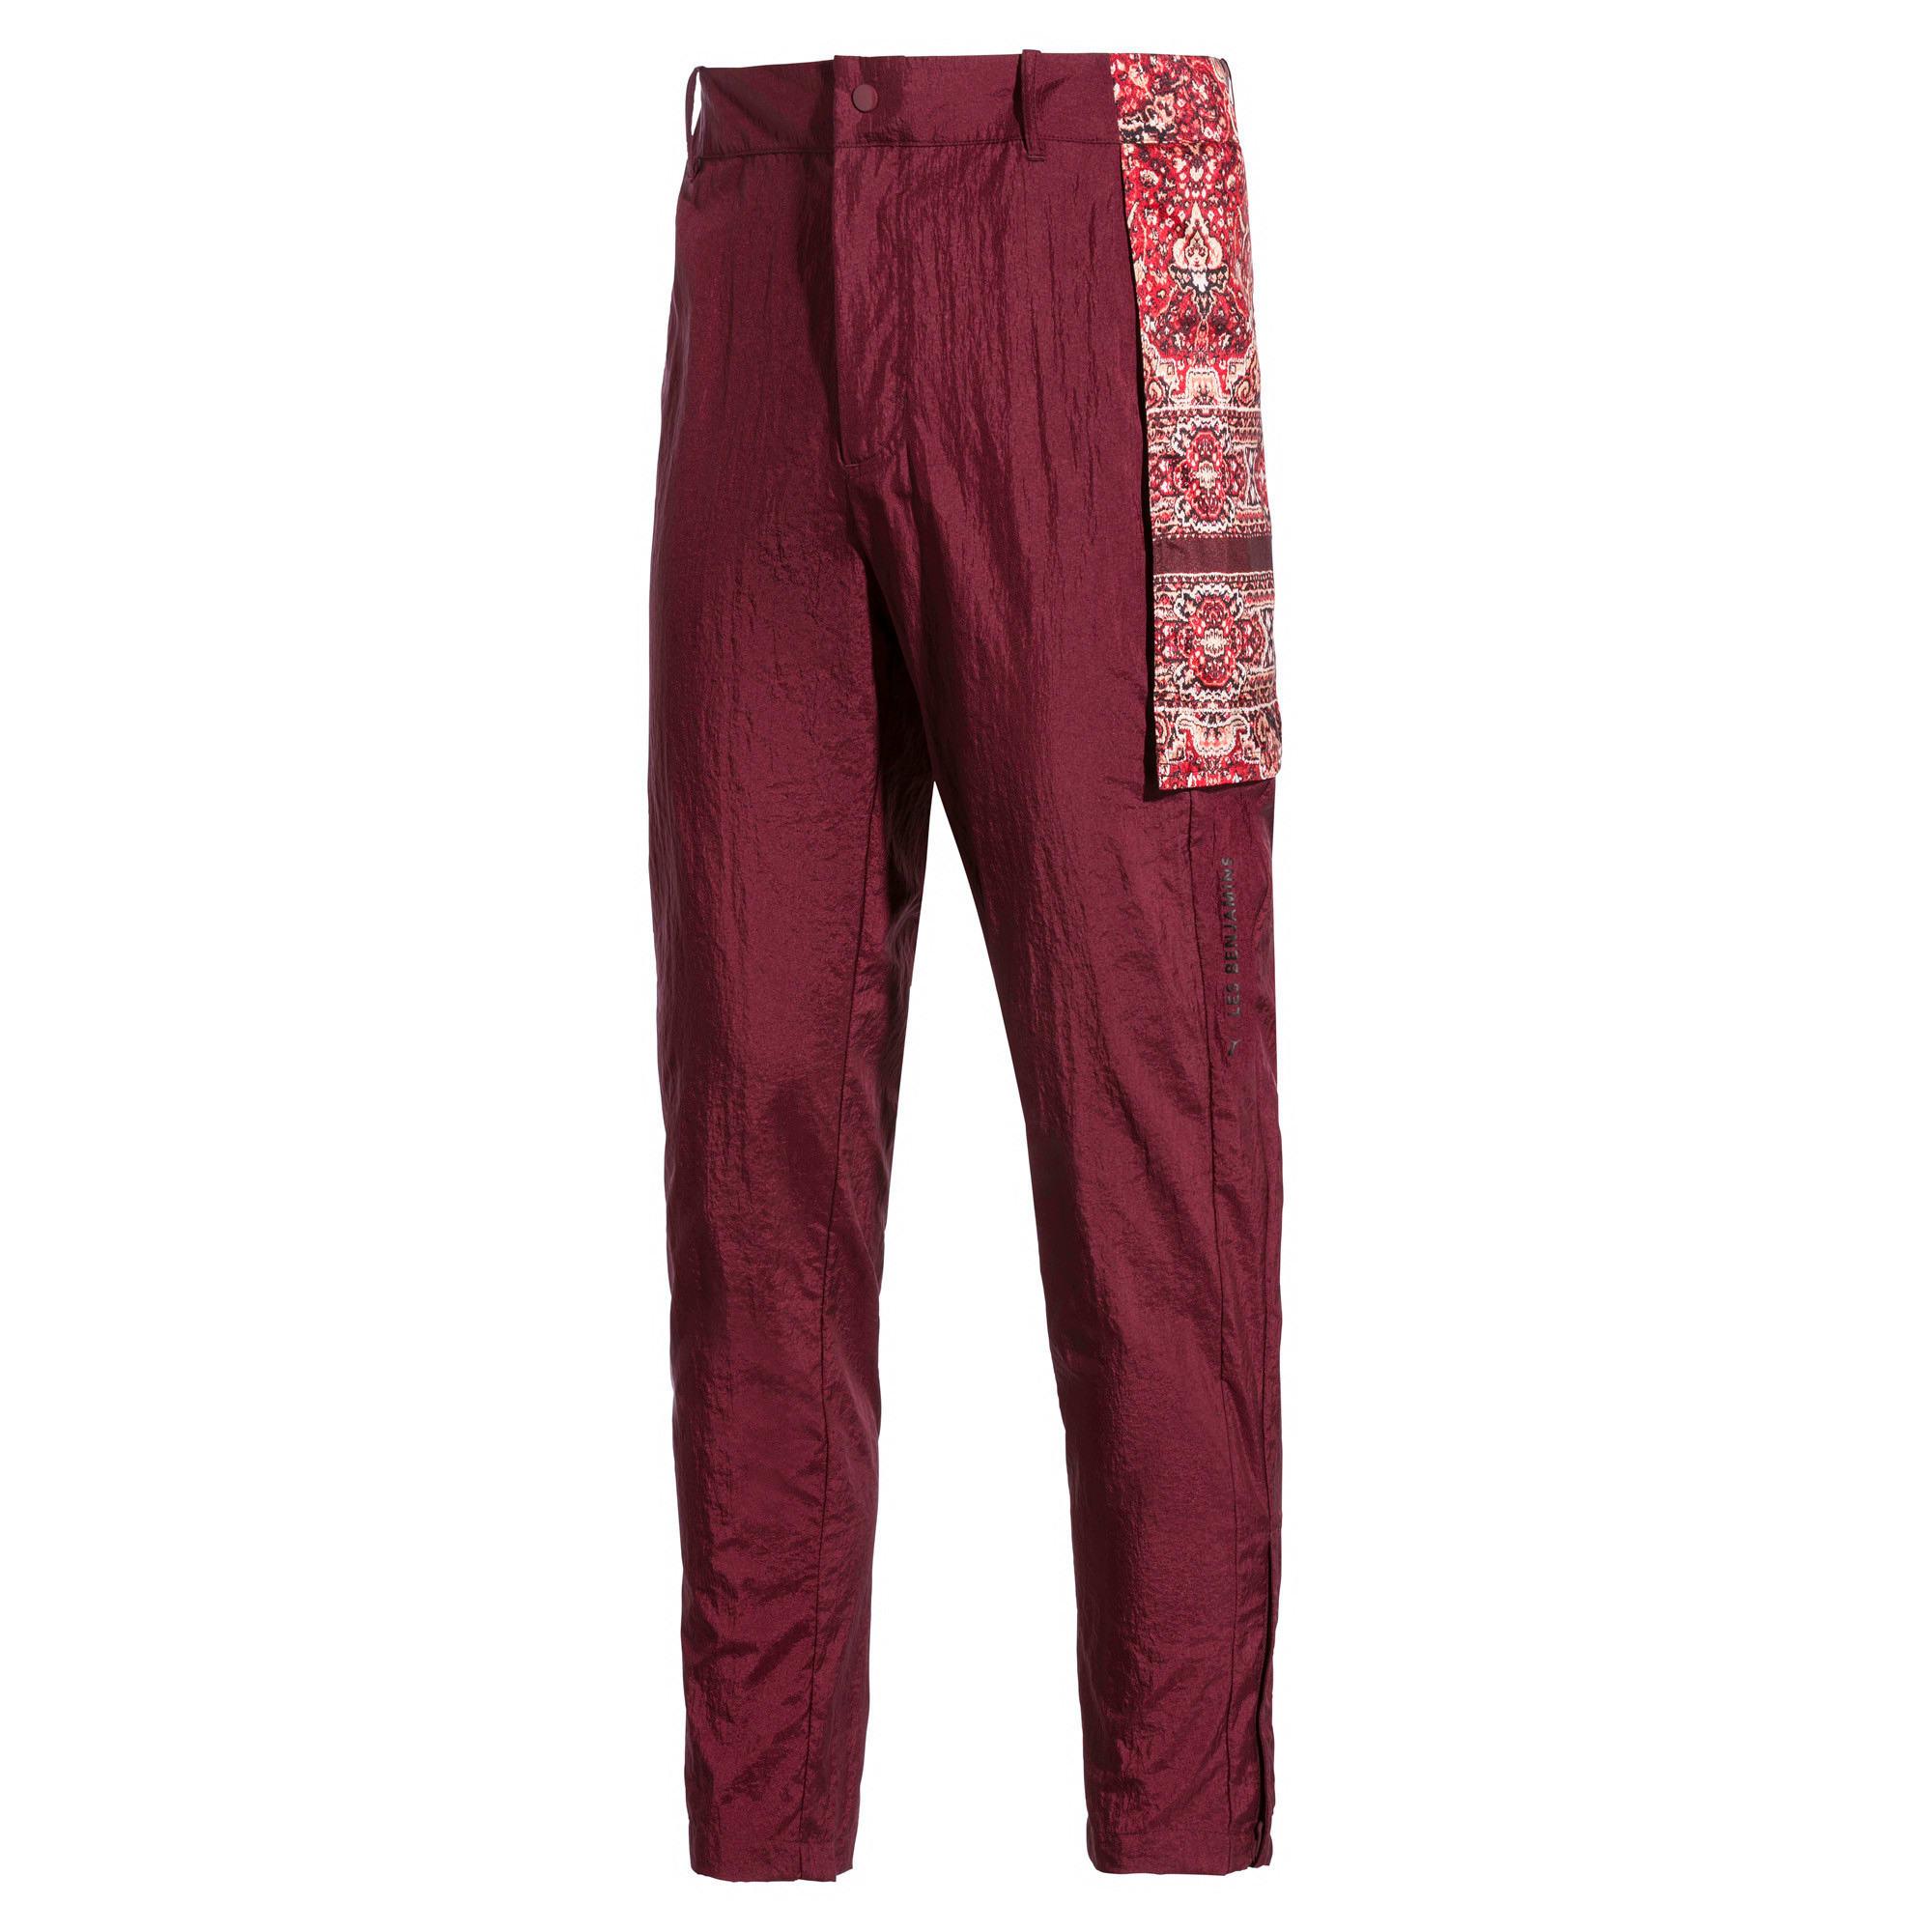 Miniatura 5 de Pantalones deportivos PUMA x LES BENJAMINS para hombre, Burgundy, mediano